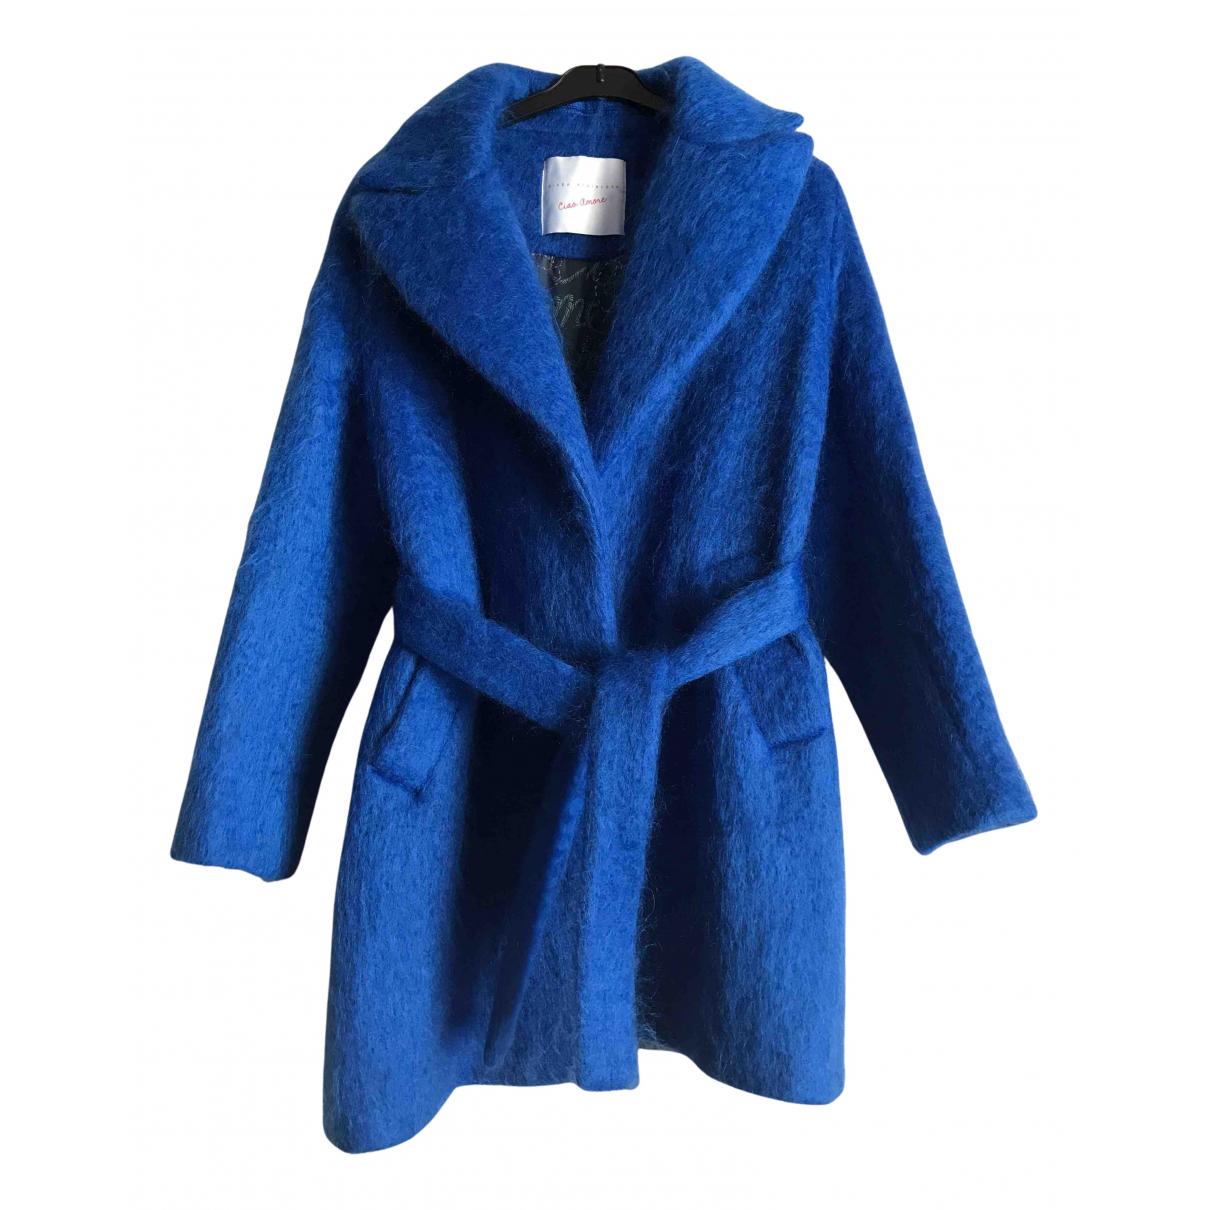 Giada Benincasa N Blue Wool coat for Women S International